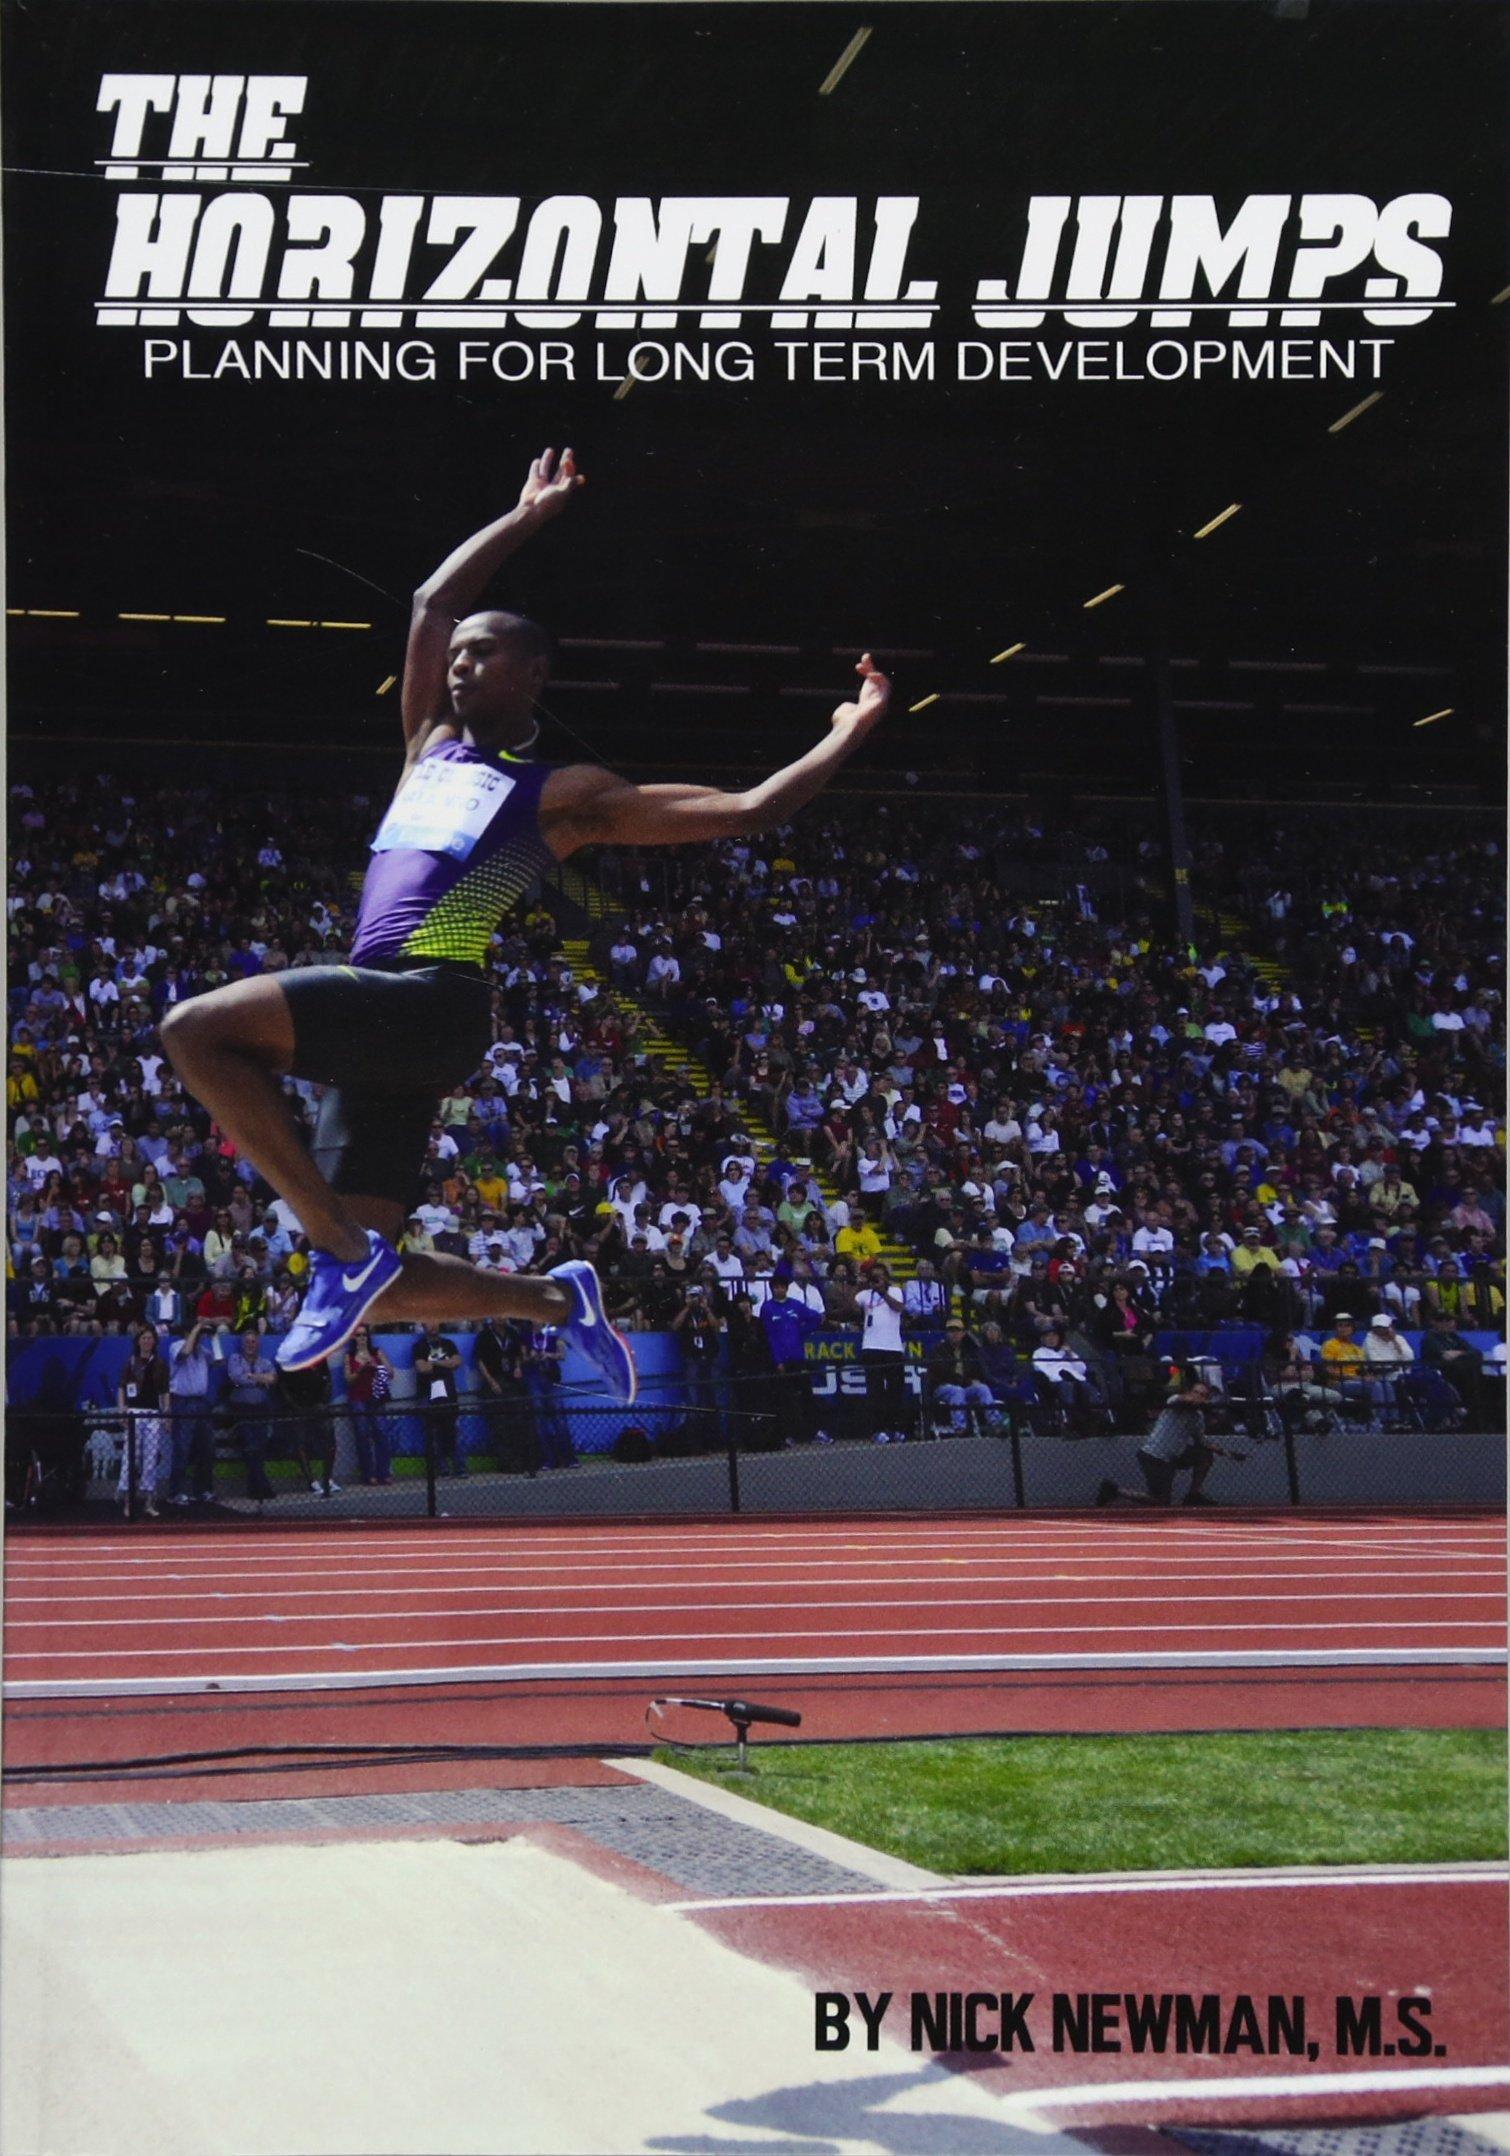 The Horizontal Jumps: Planning for Long Term Development